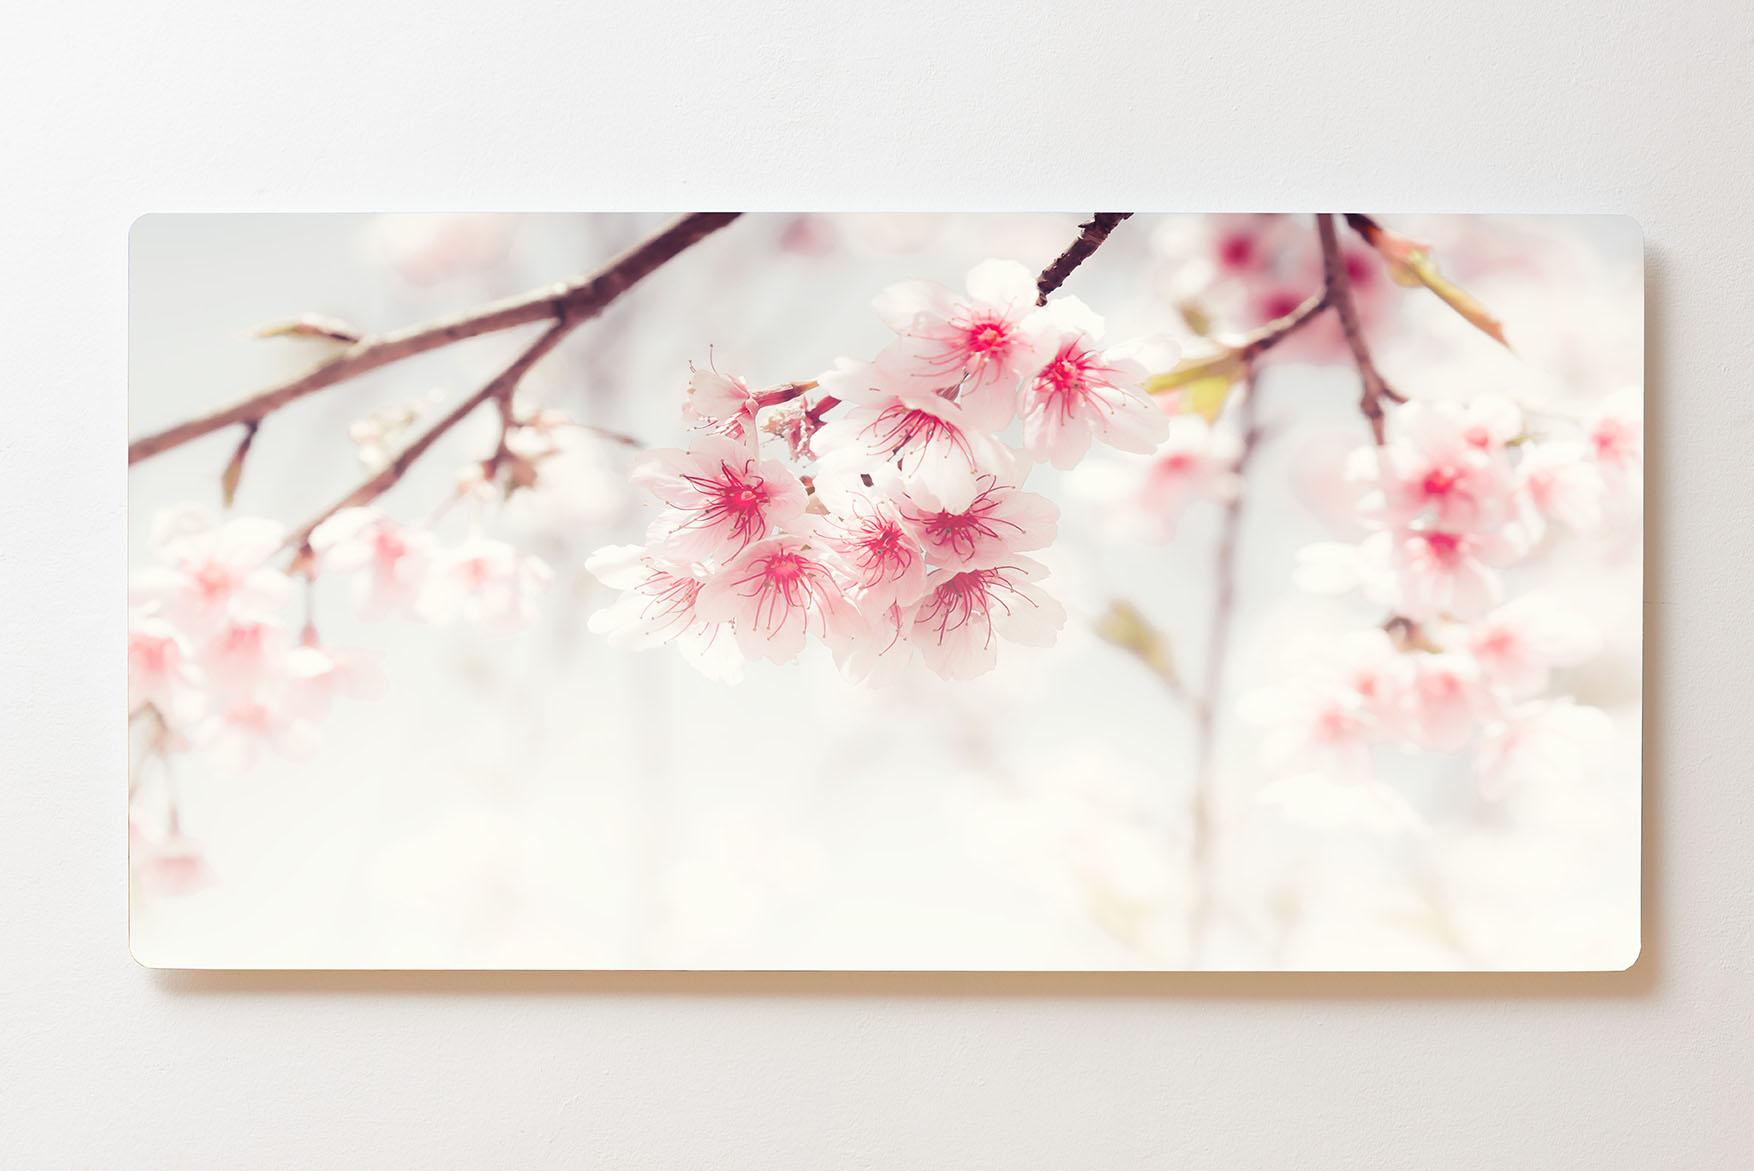 Magnettafel BACKLIGHT 120x60cm Motiv-Wandbild M159 Kirschblüte